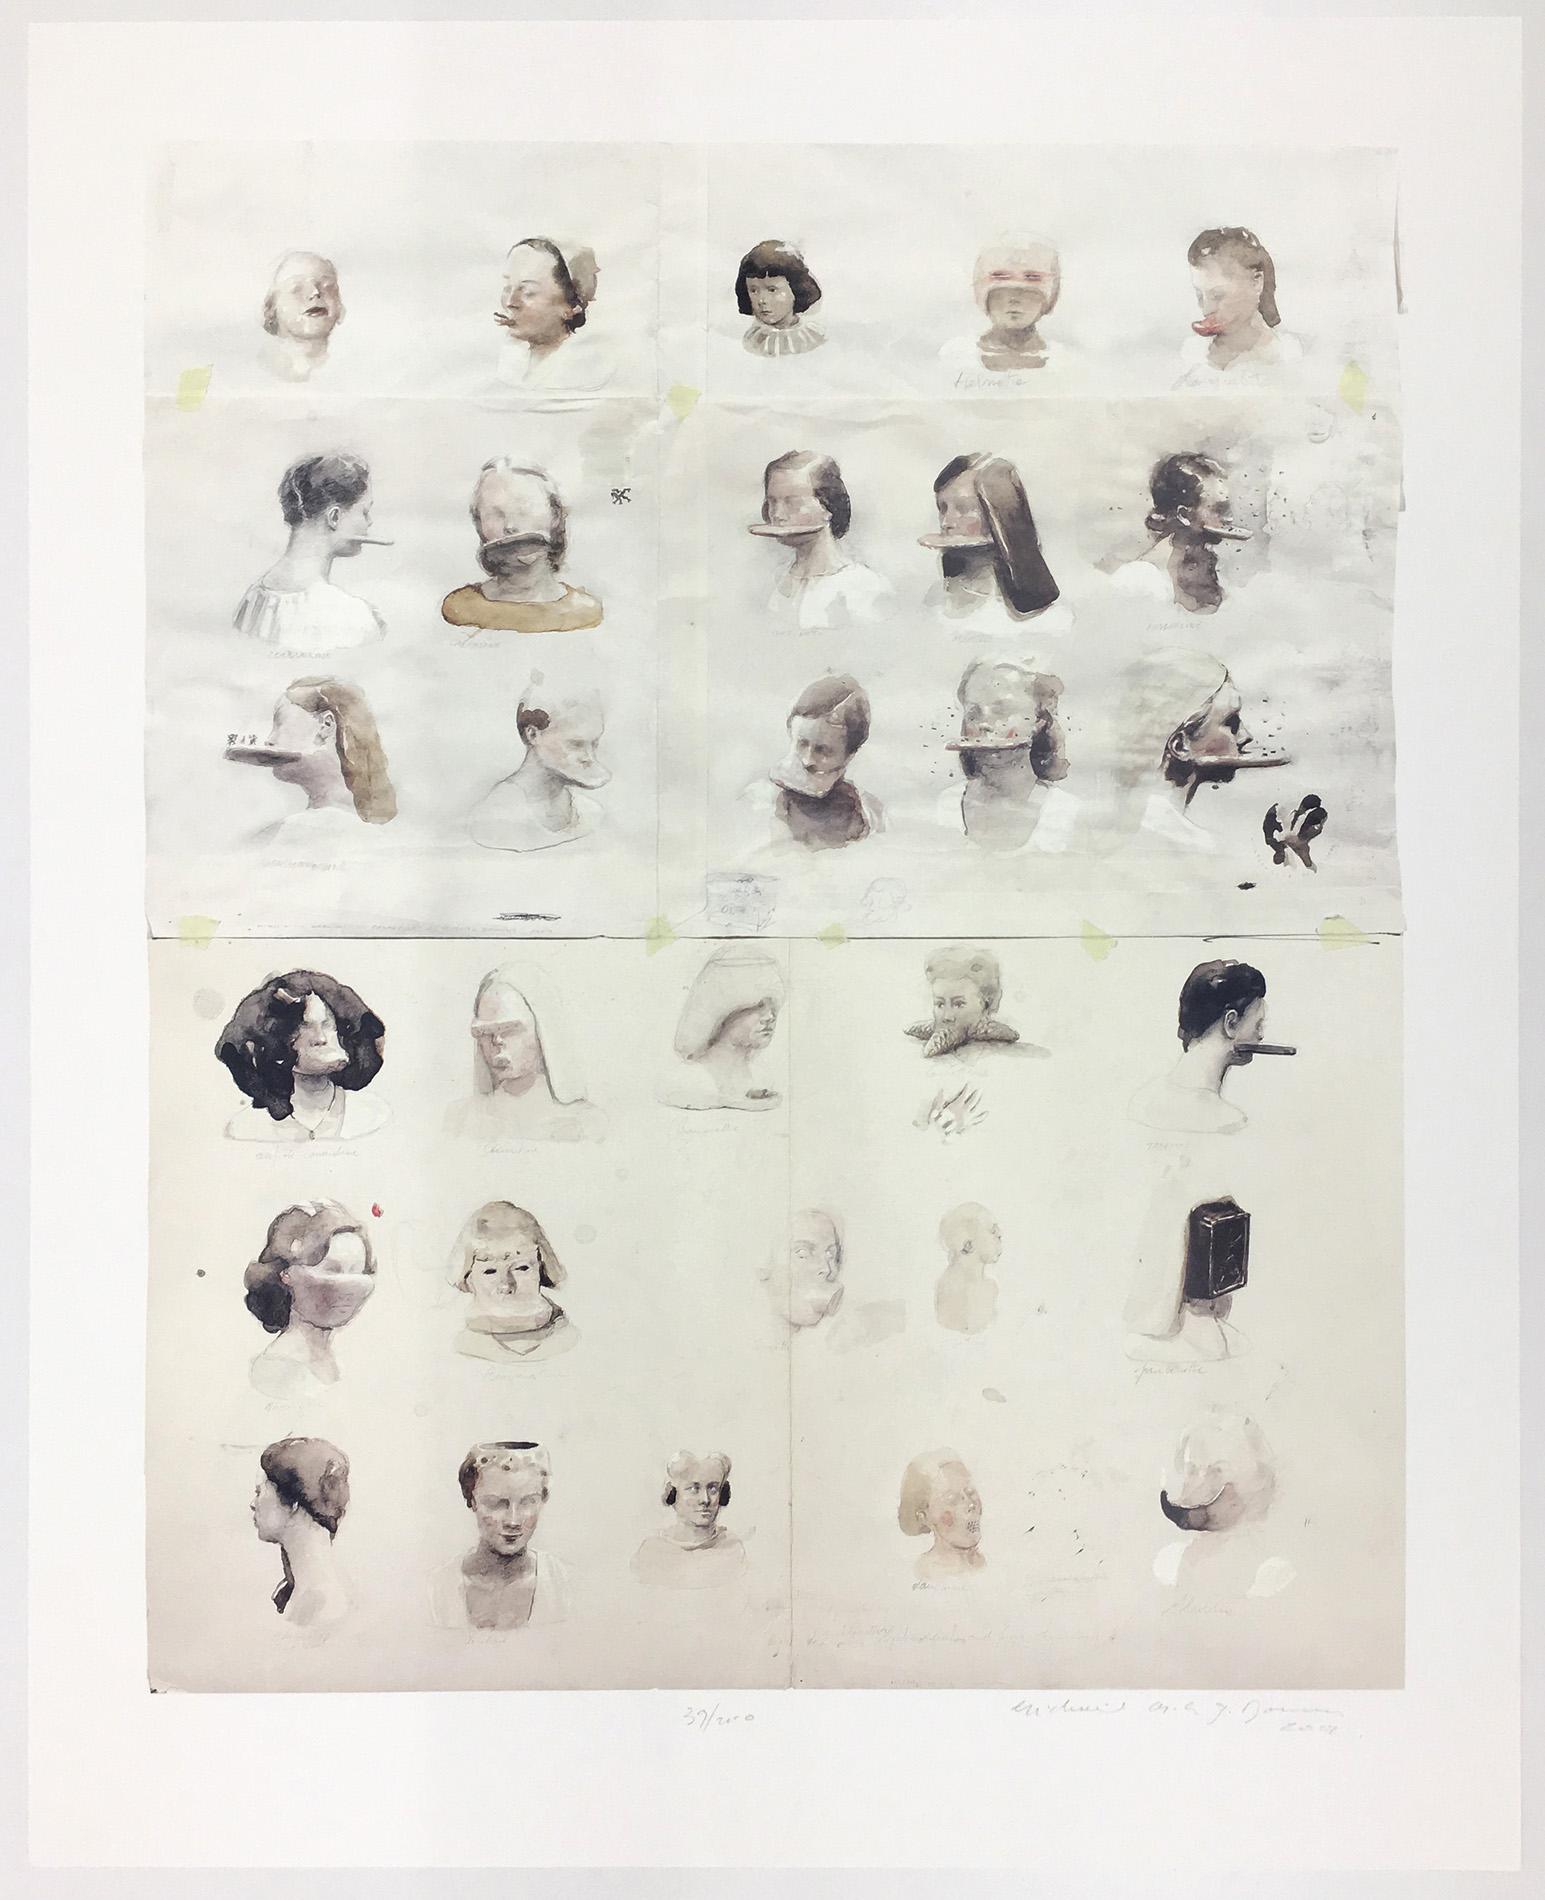 Michaël Borremans   Right Decisions, slight modifications and fresh etymology 2002